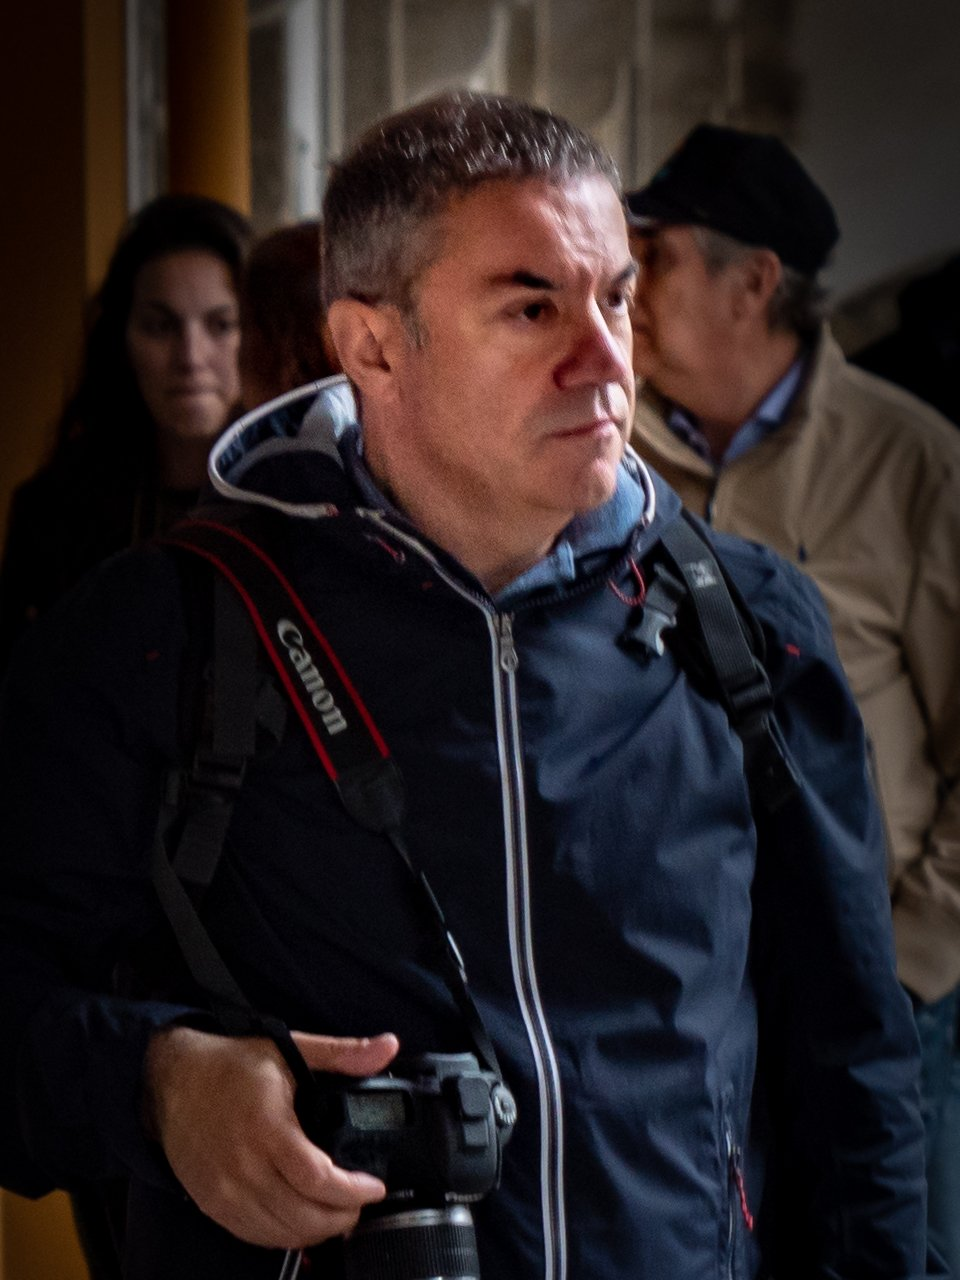 Joaquim-Garrido-Pictury-Photo-Tours-Porto-Portugal